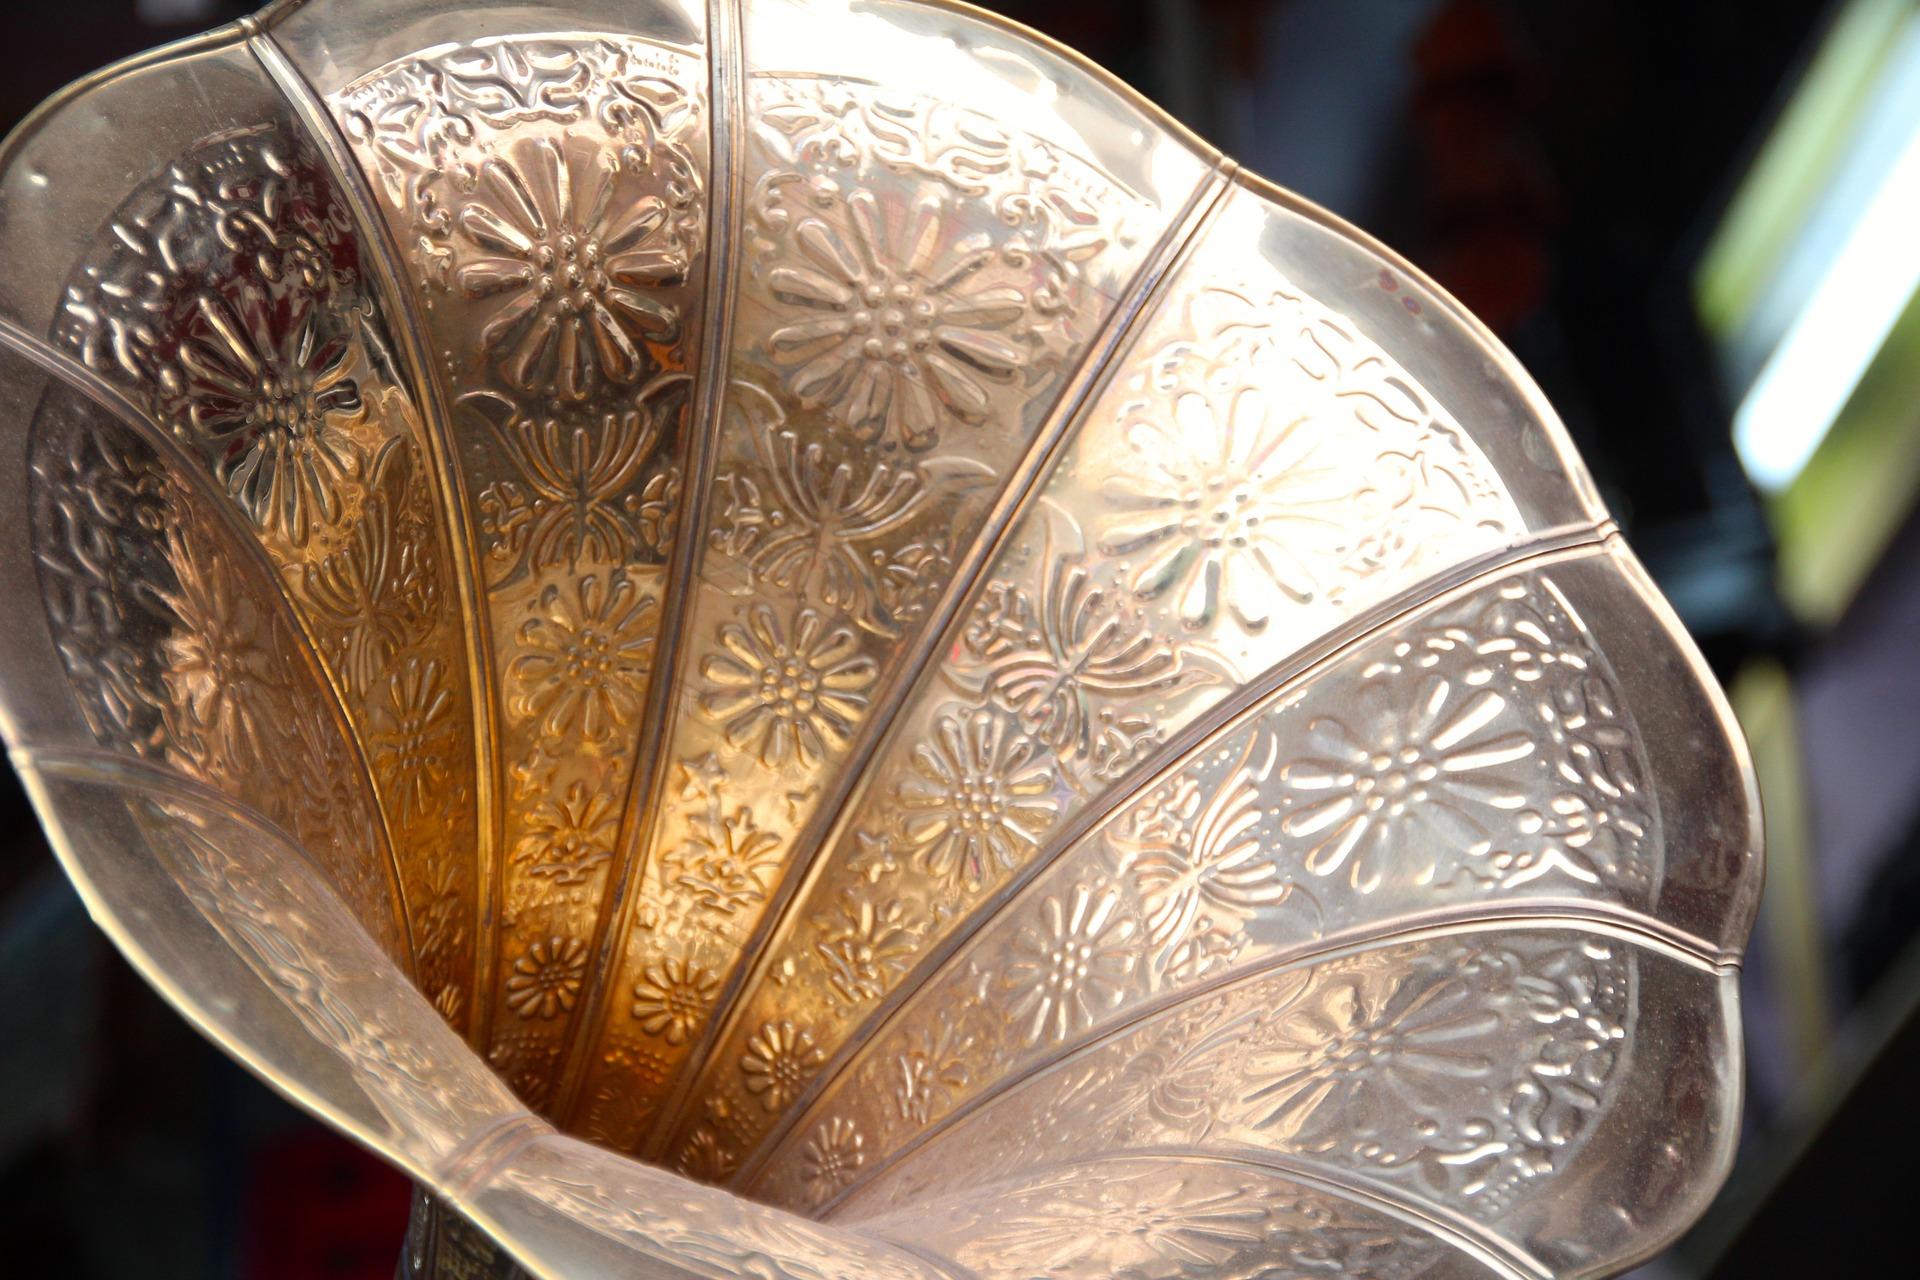 A bronze, antique gramophone.